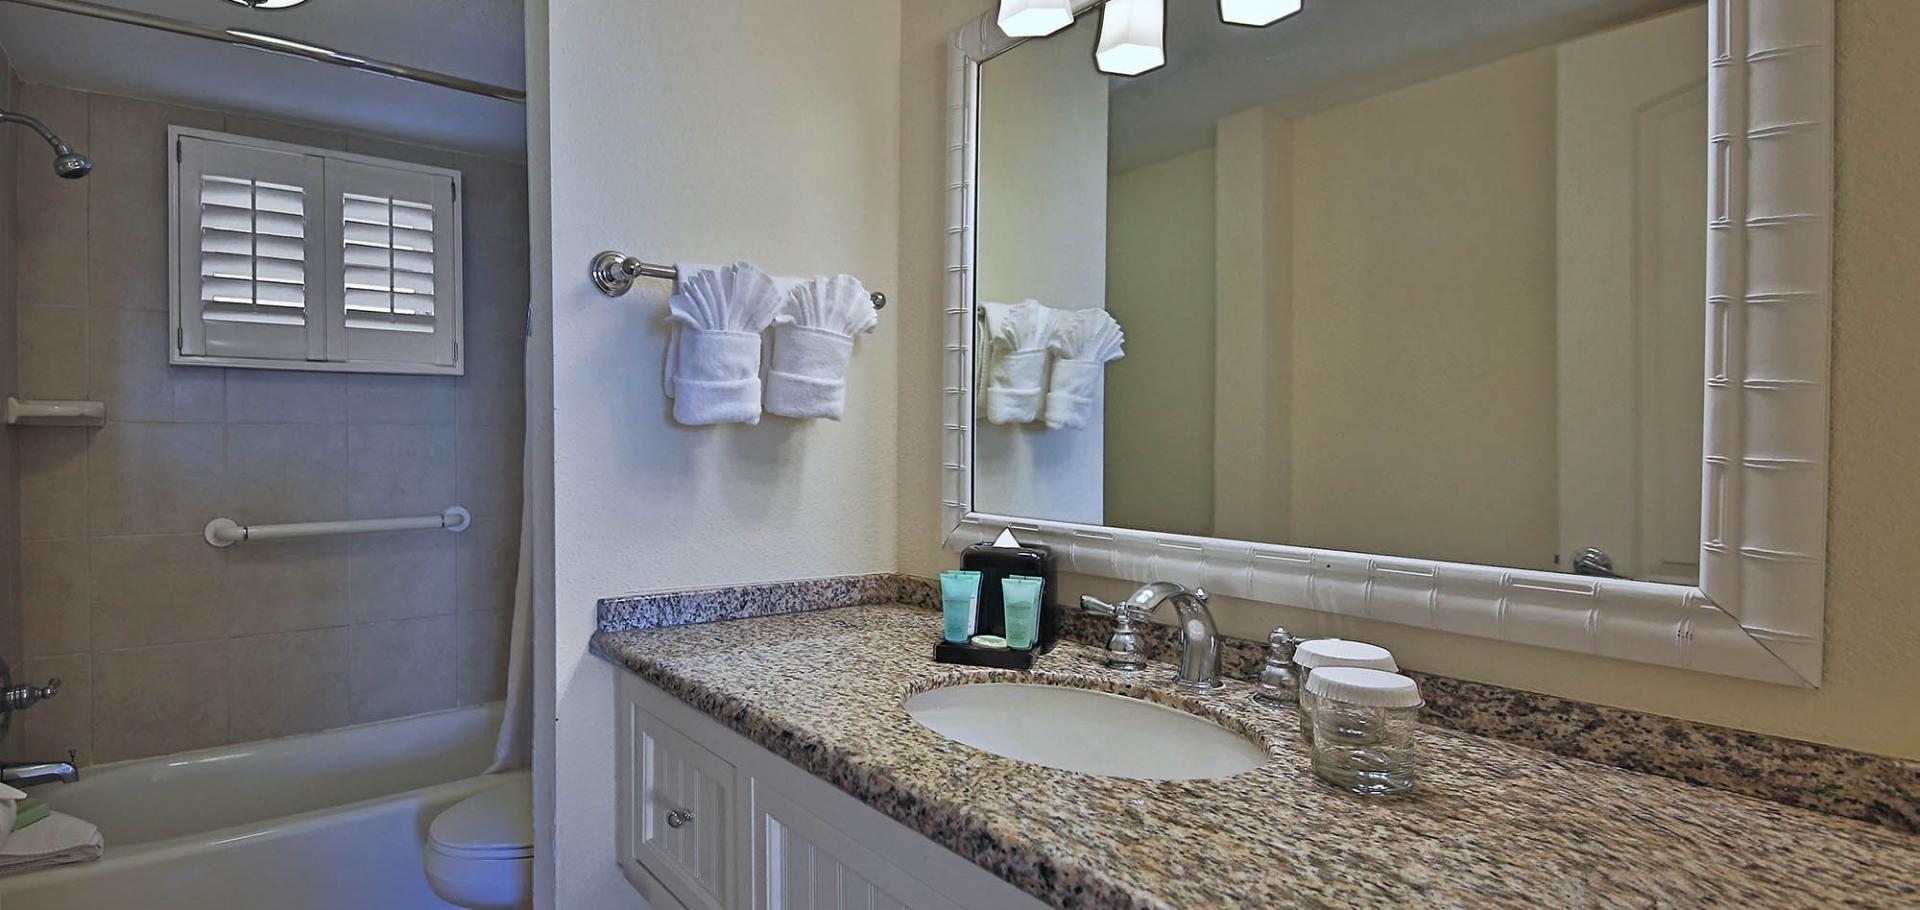 Sanibel Inn bathroom mirror